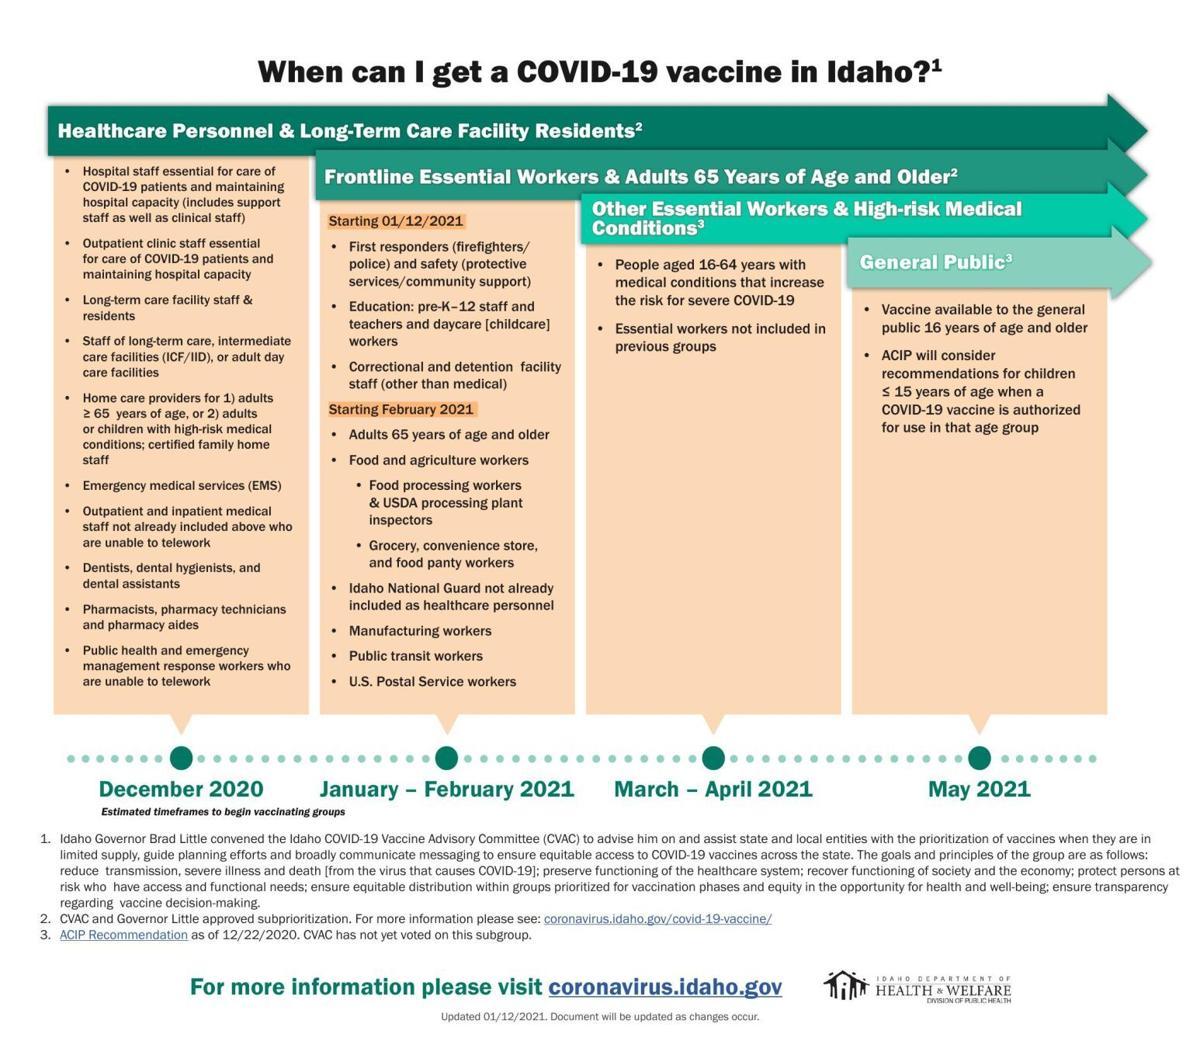 New Idaho vaccine timeline, Jan. 12 2021